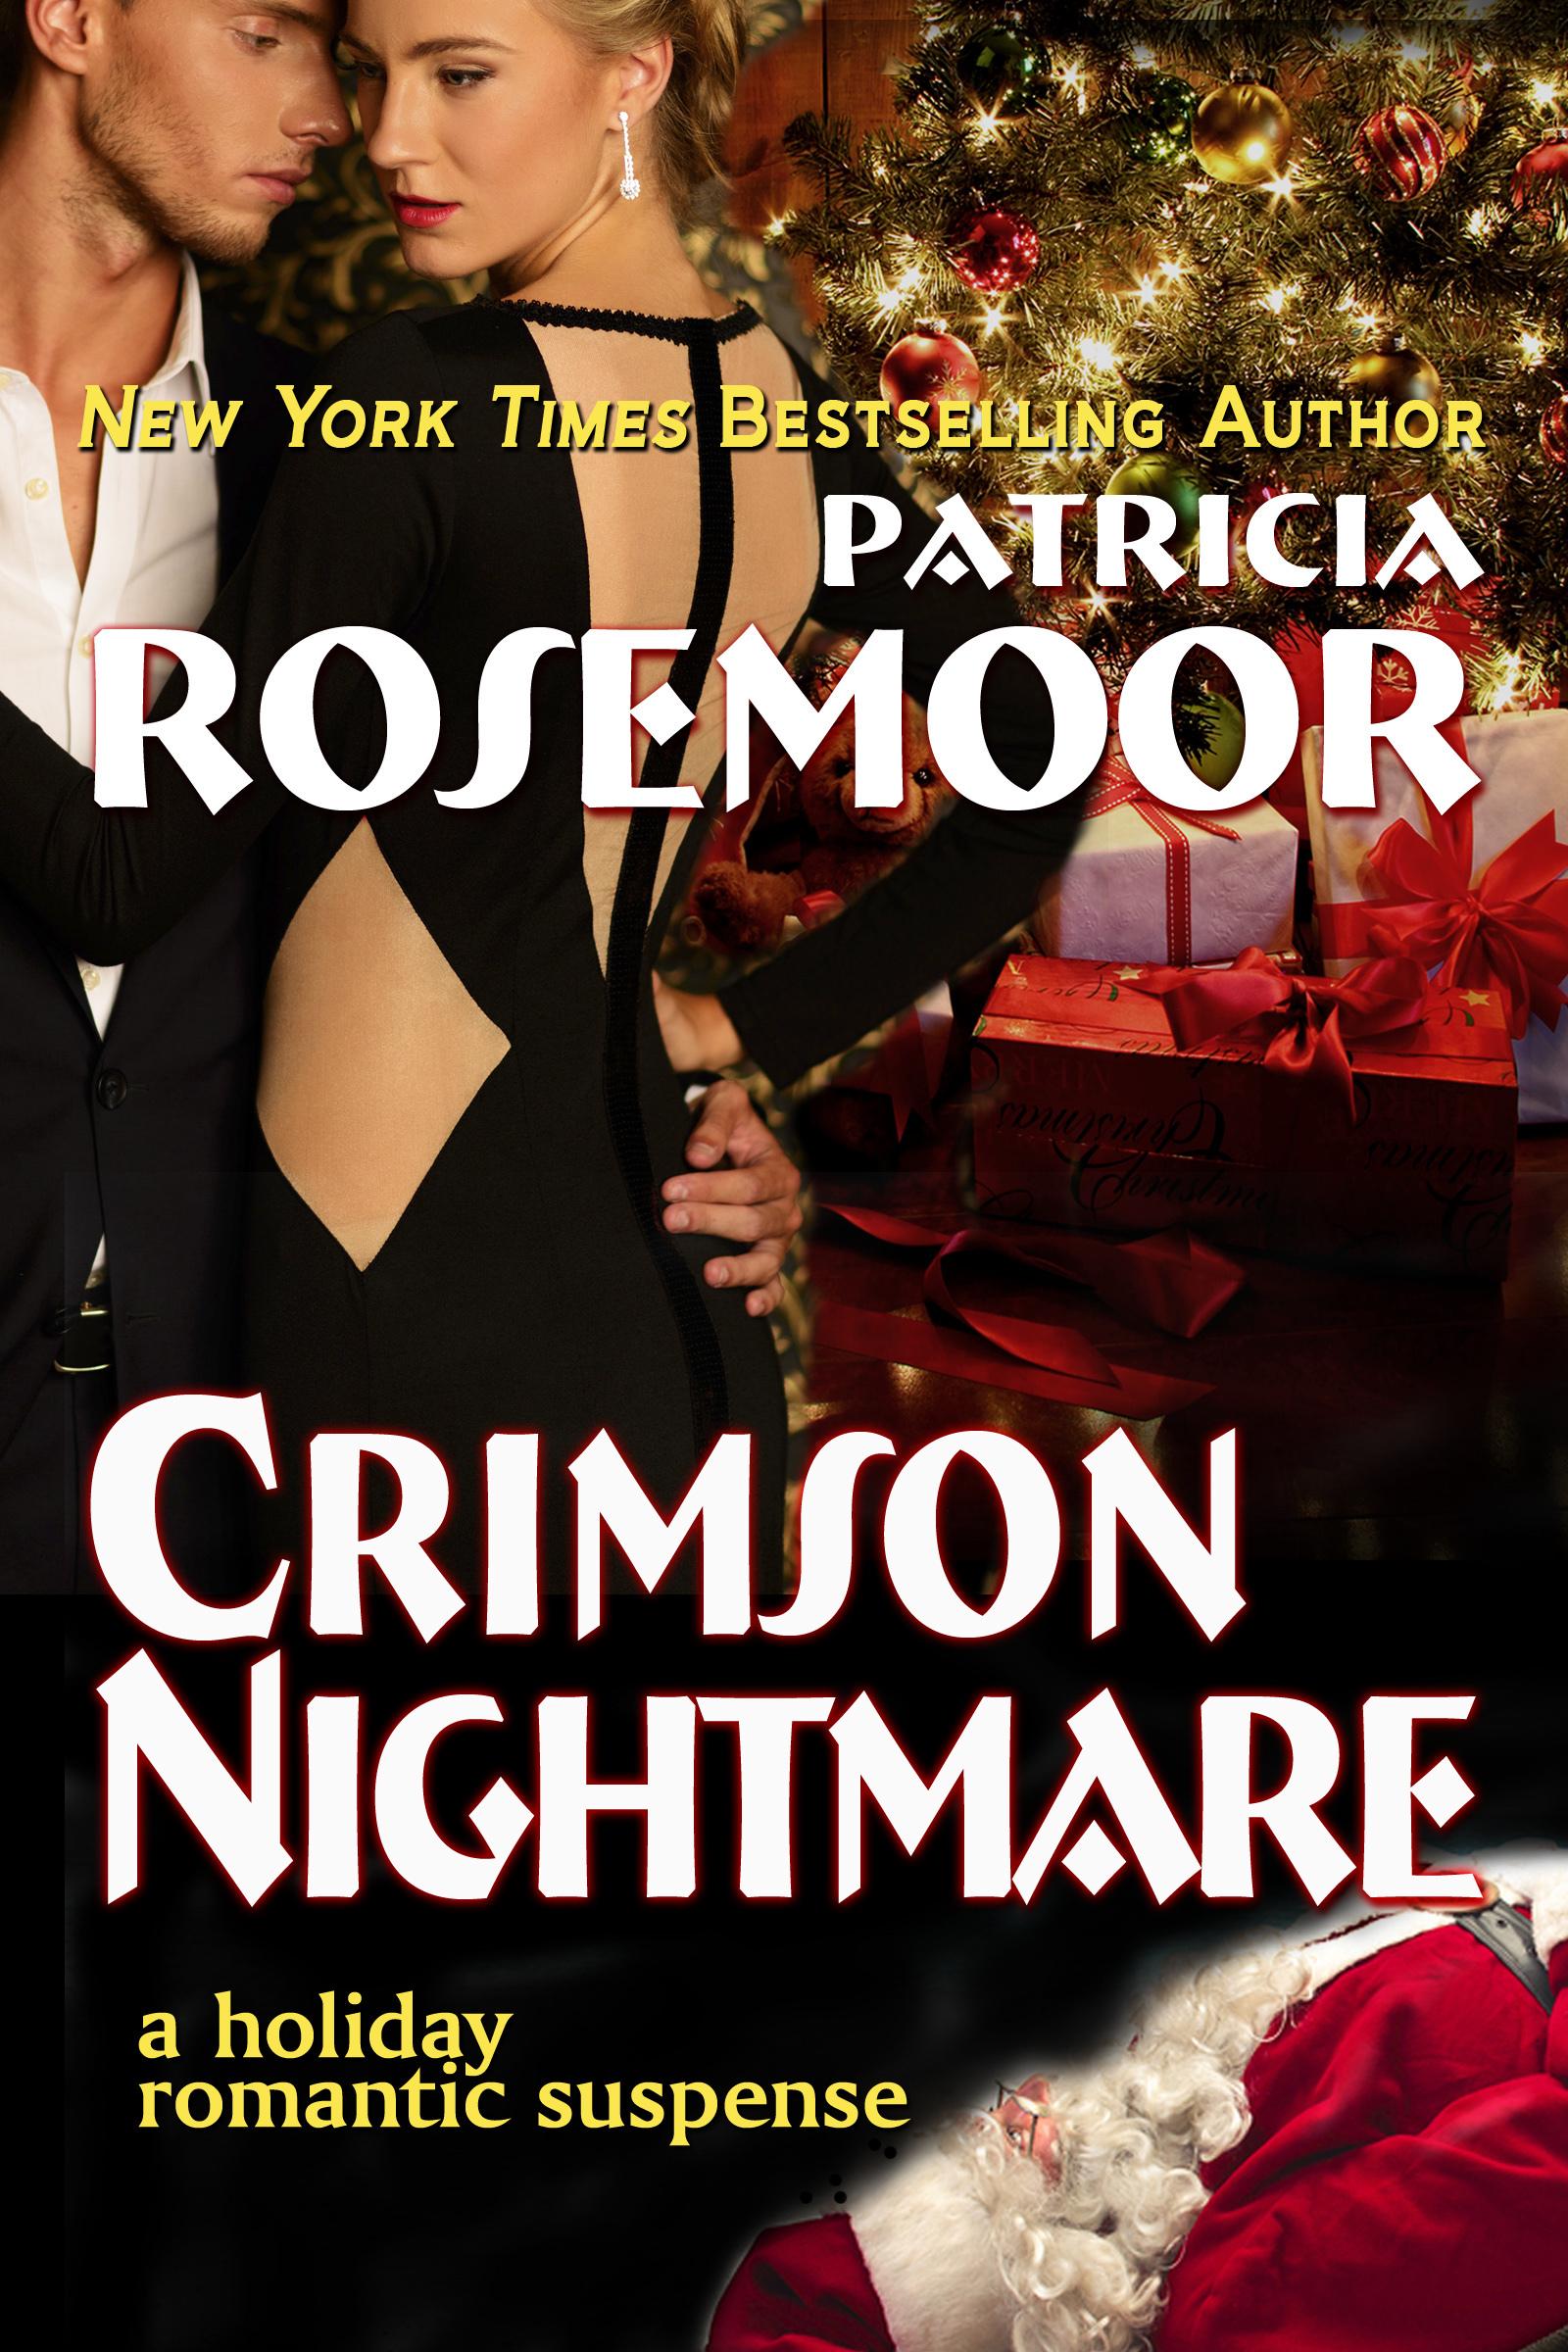 Crimson Nightmare Patricia Rosemoor